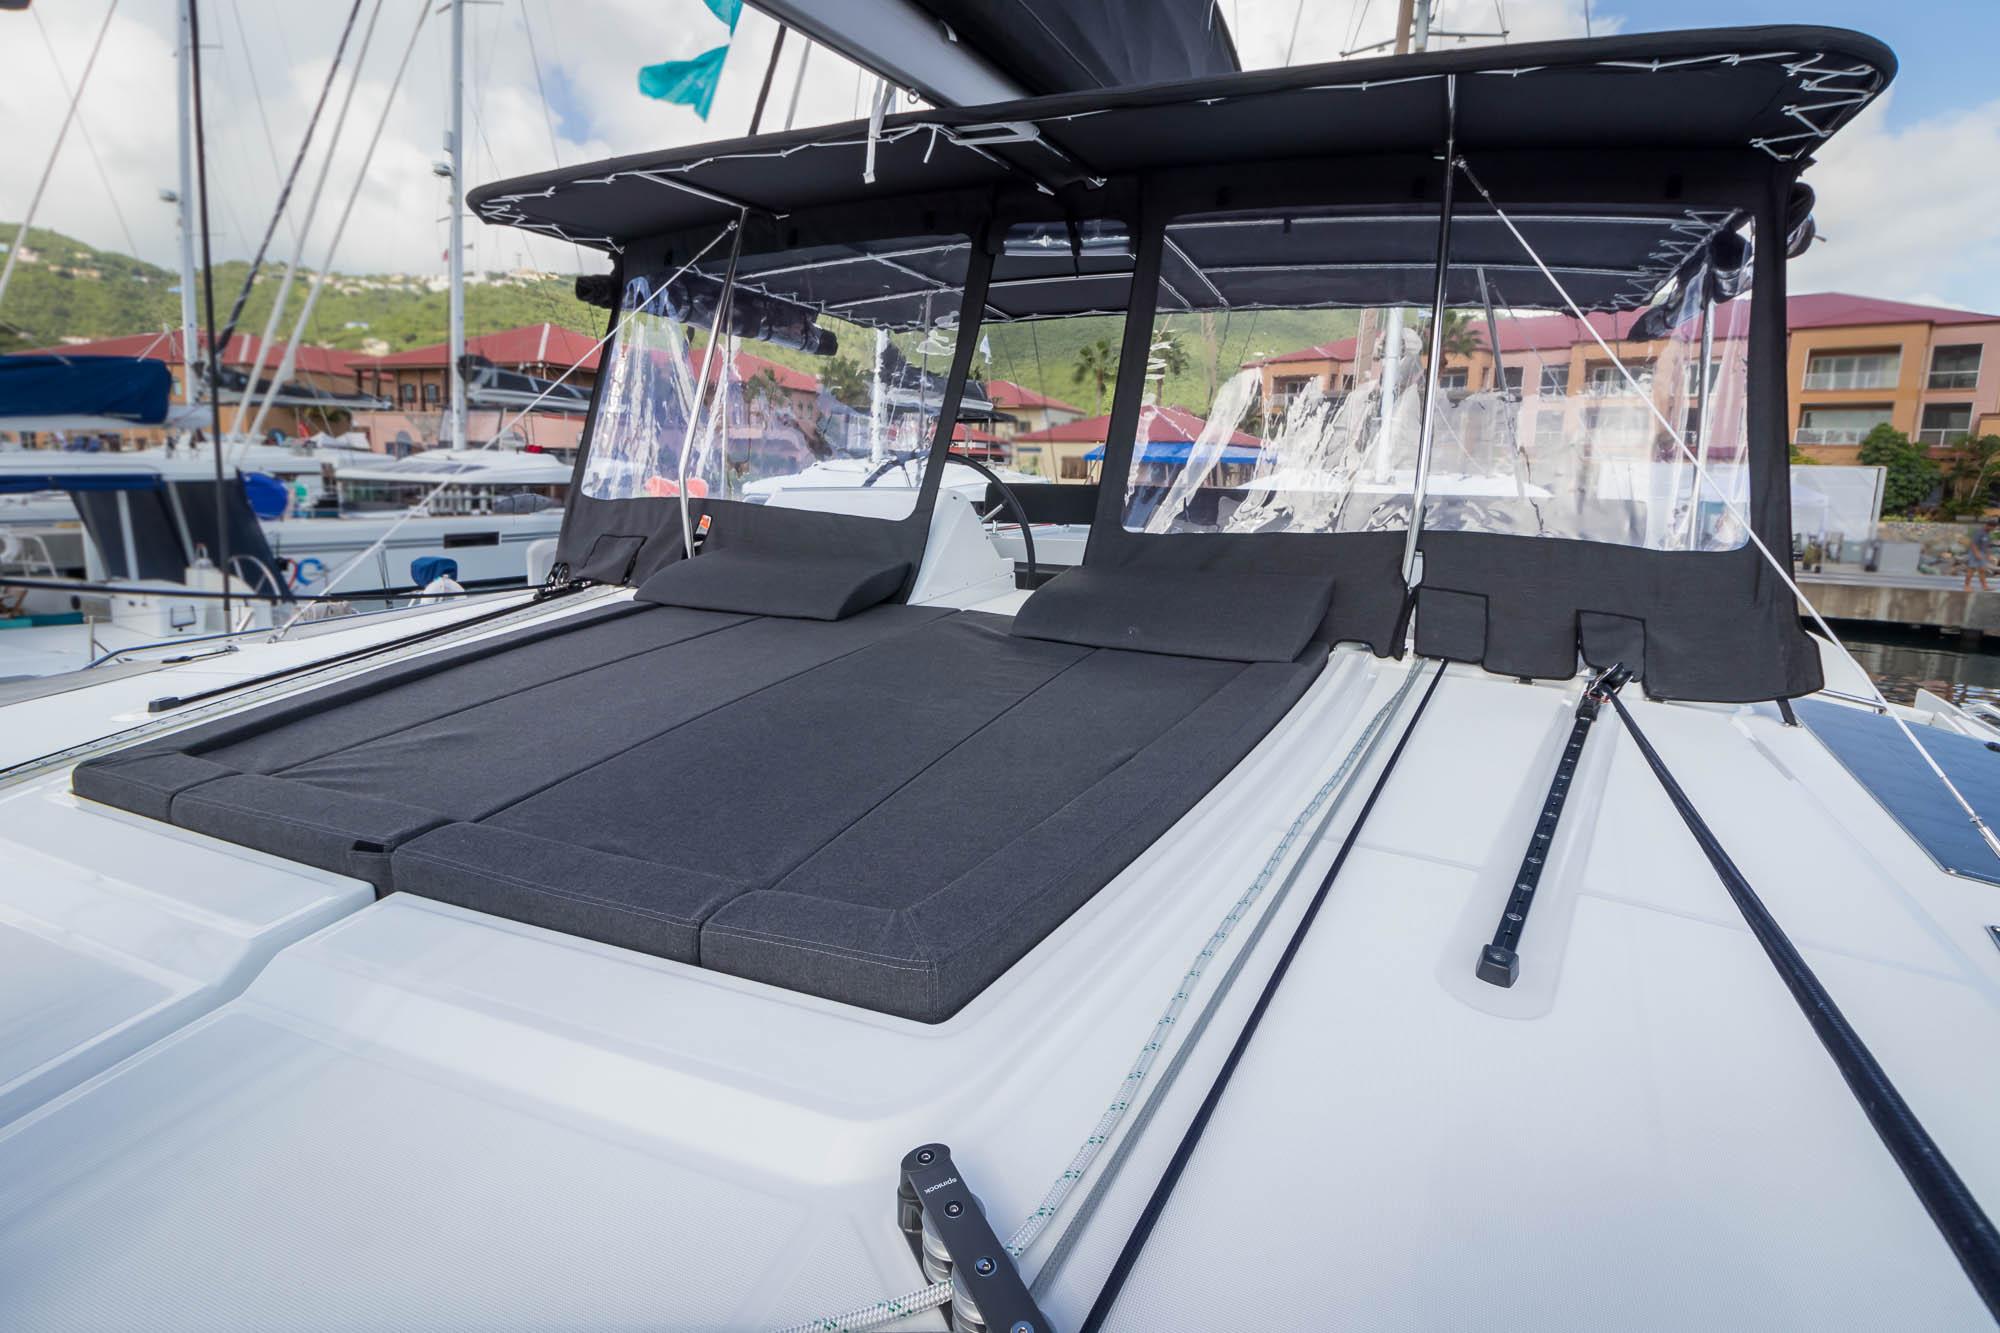 2018 Lagoon 450-charter catamaran-Flotation Therapy